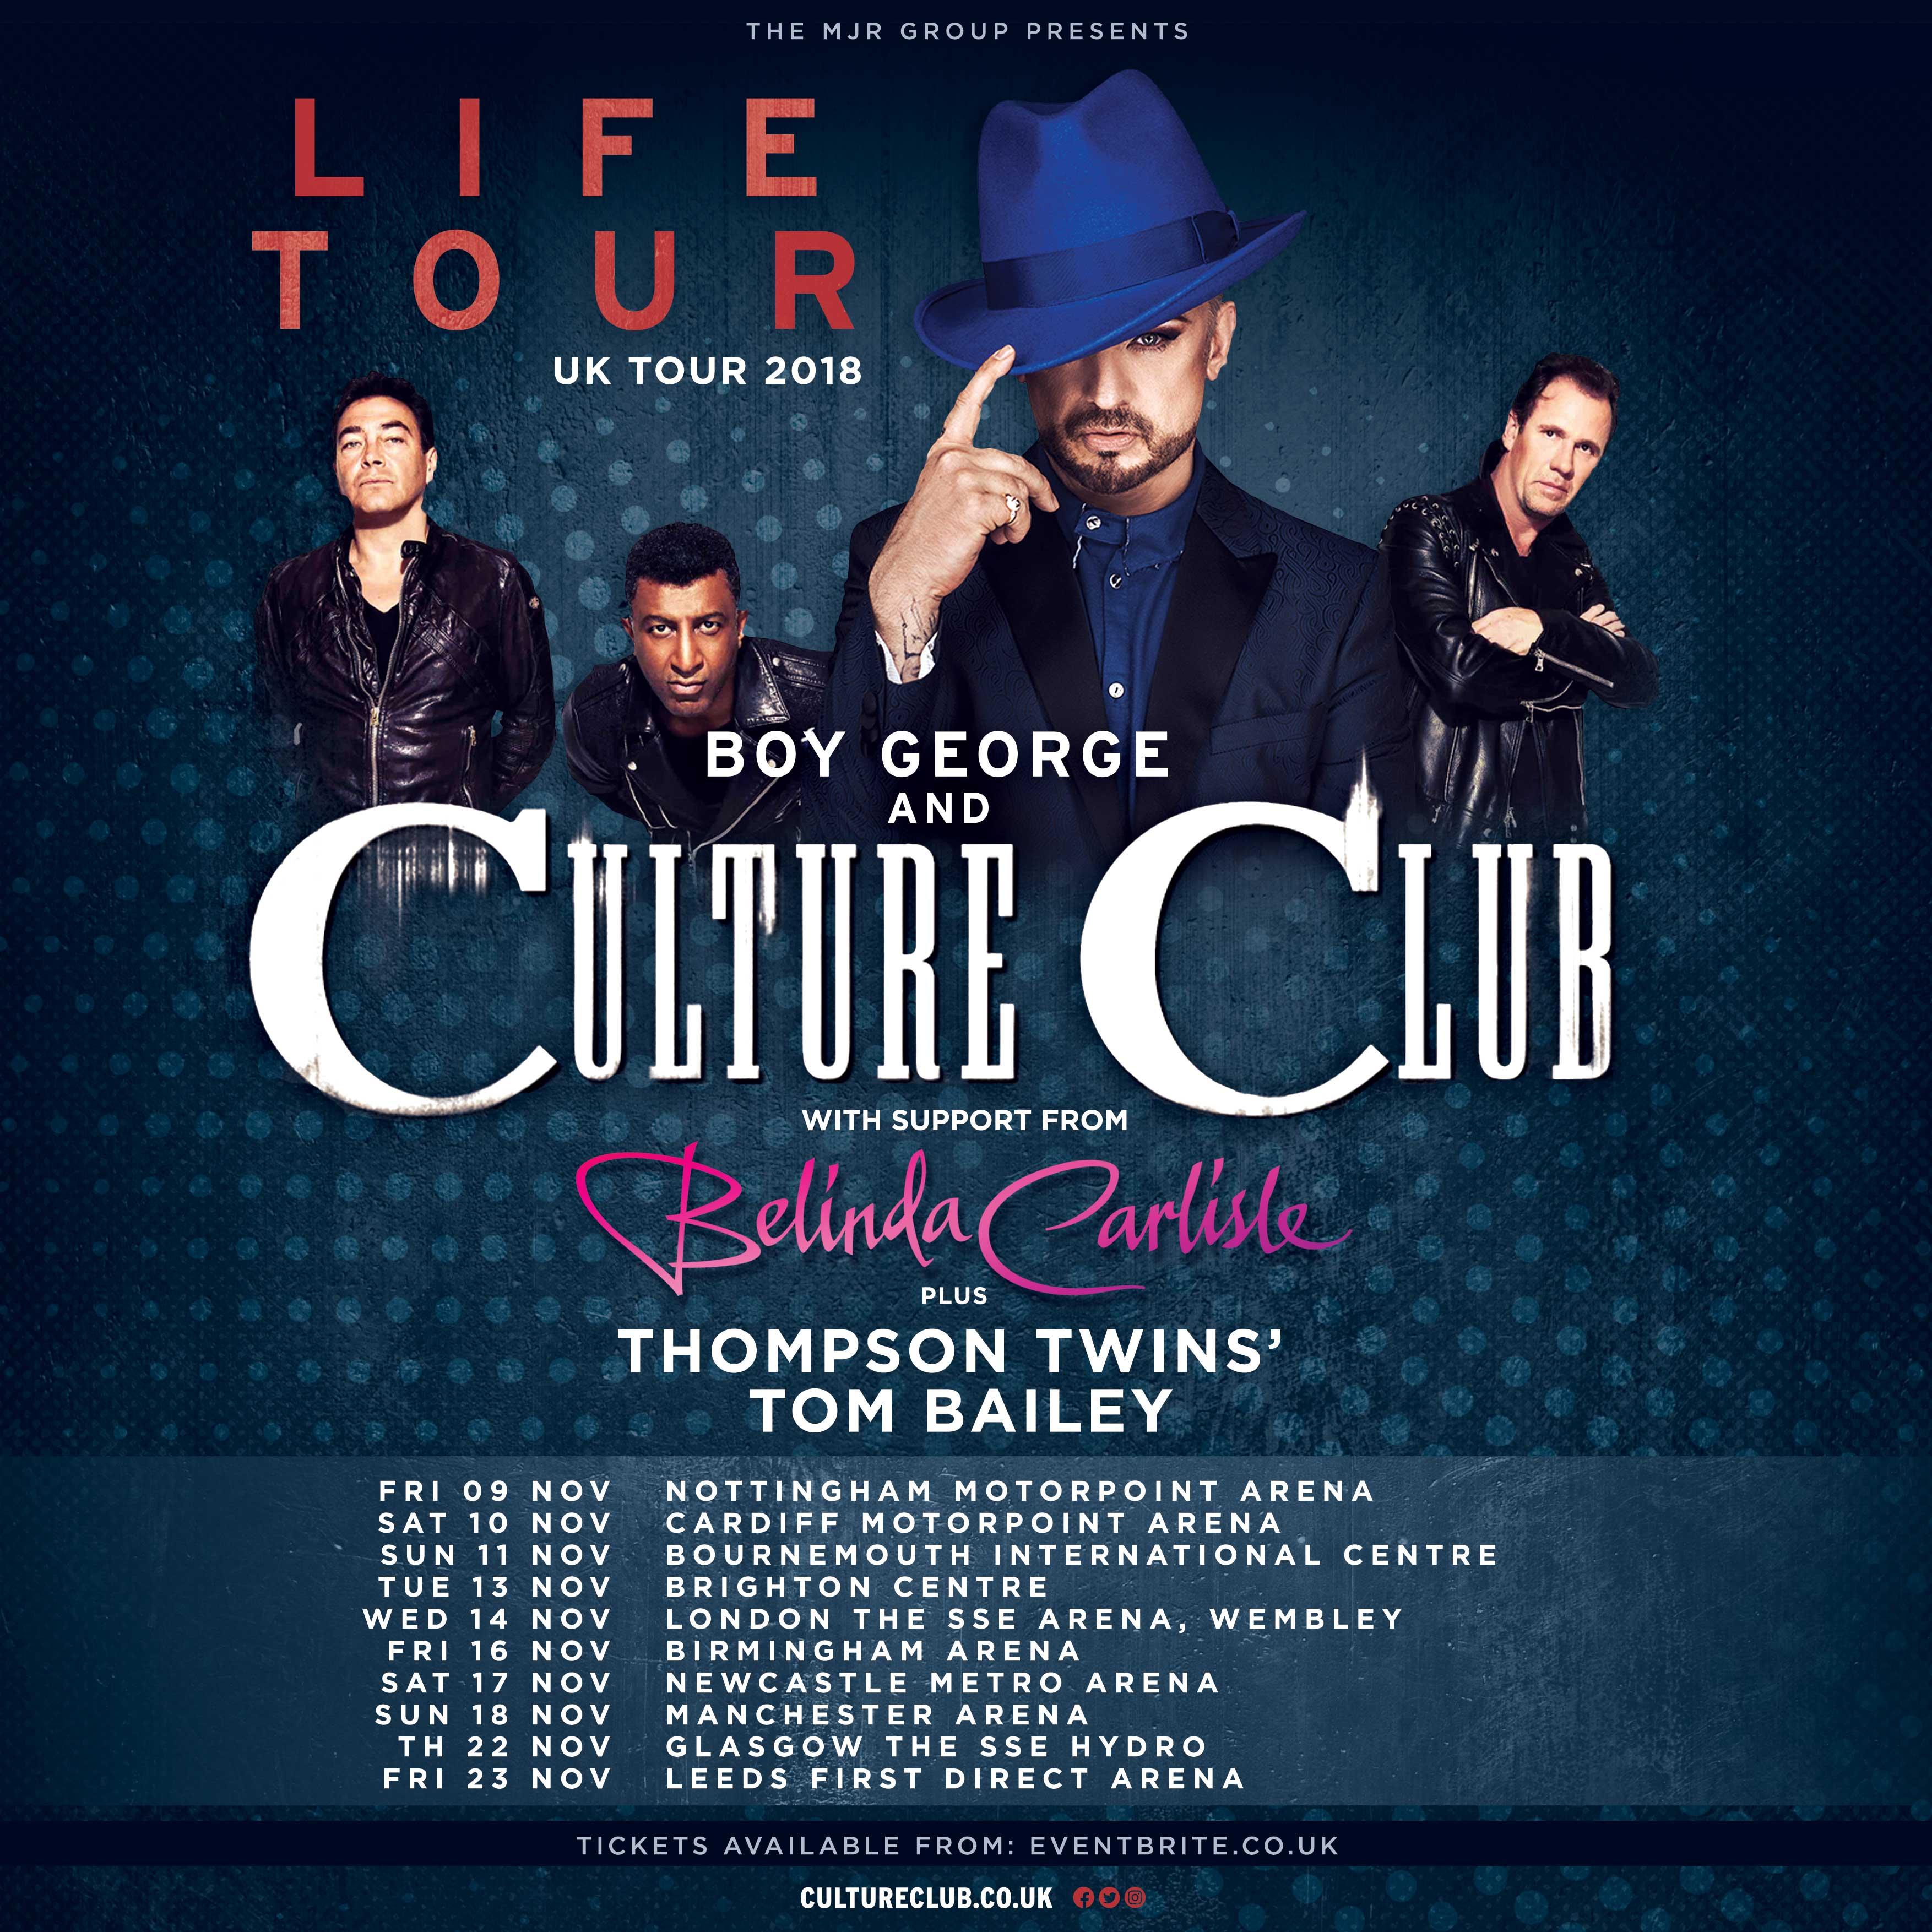 Boy George & Culture Club, Belinda Carlisle and UK Tour!